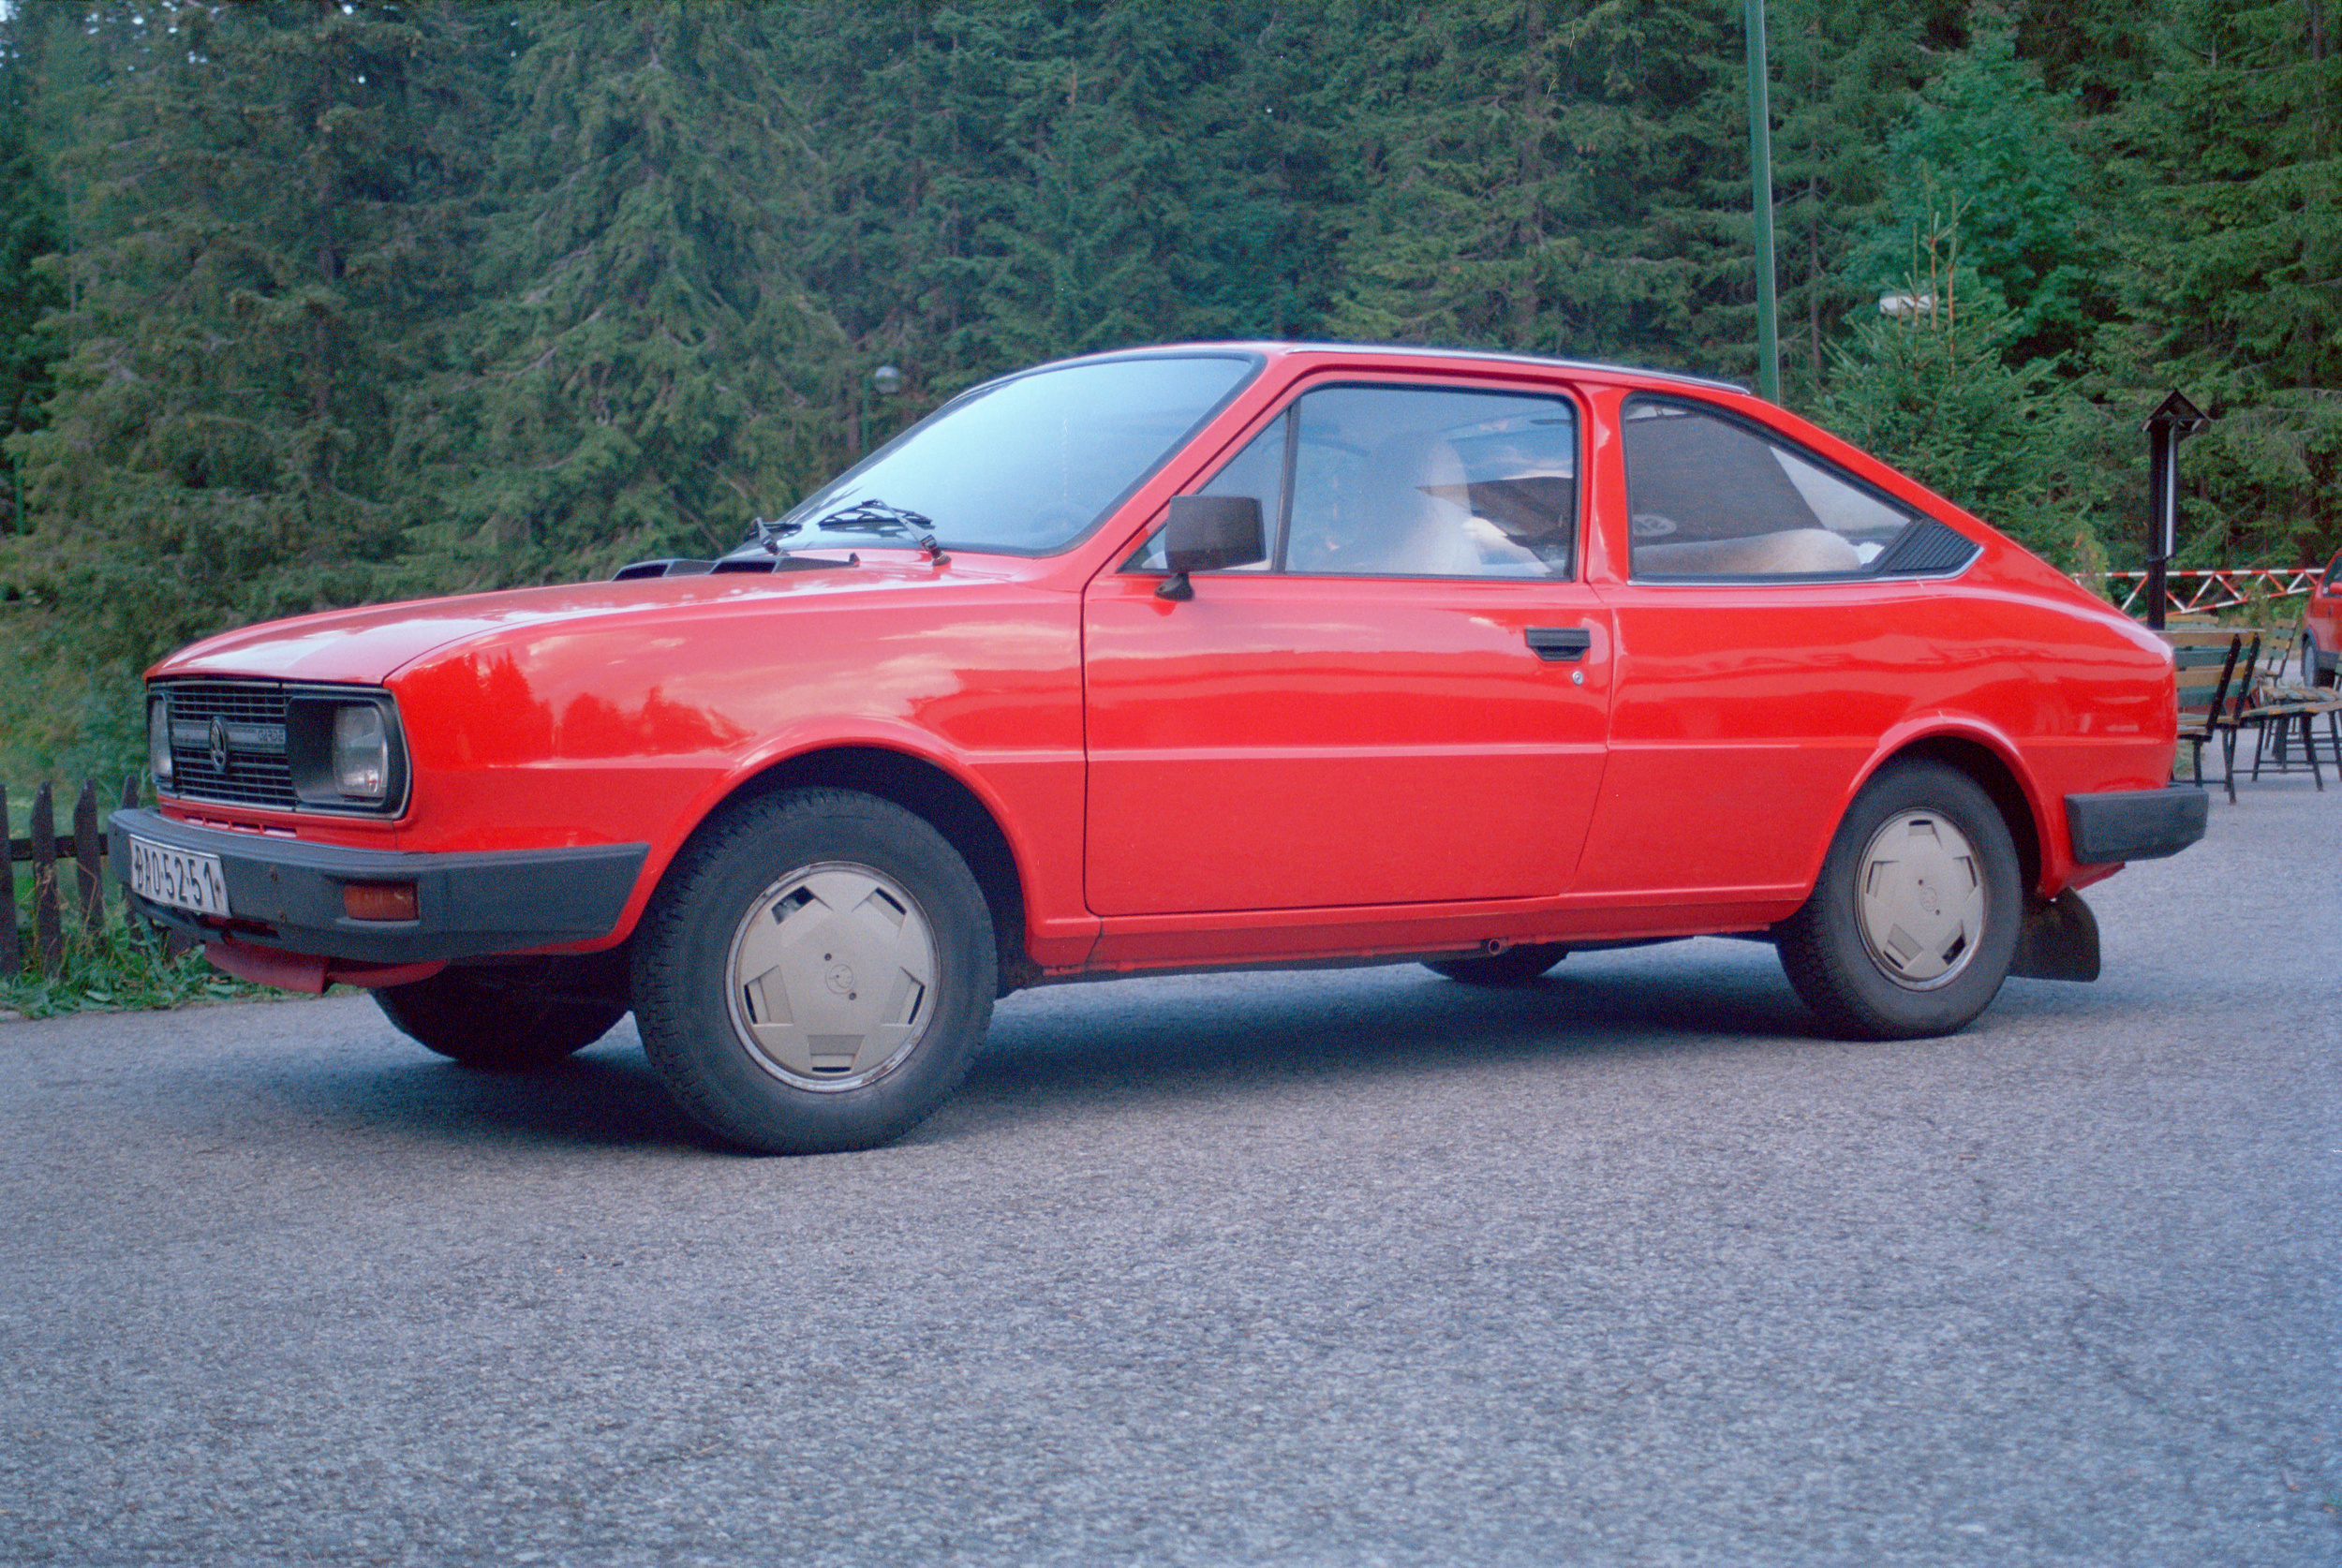 1981 Skoda 125